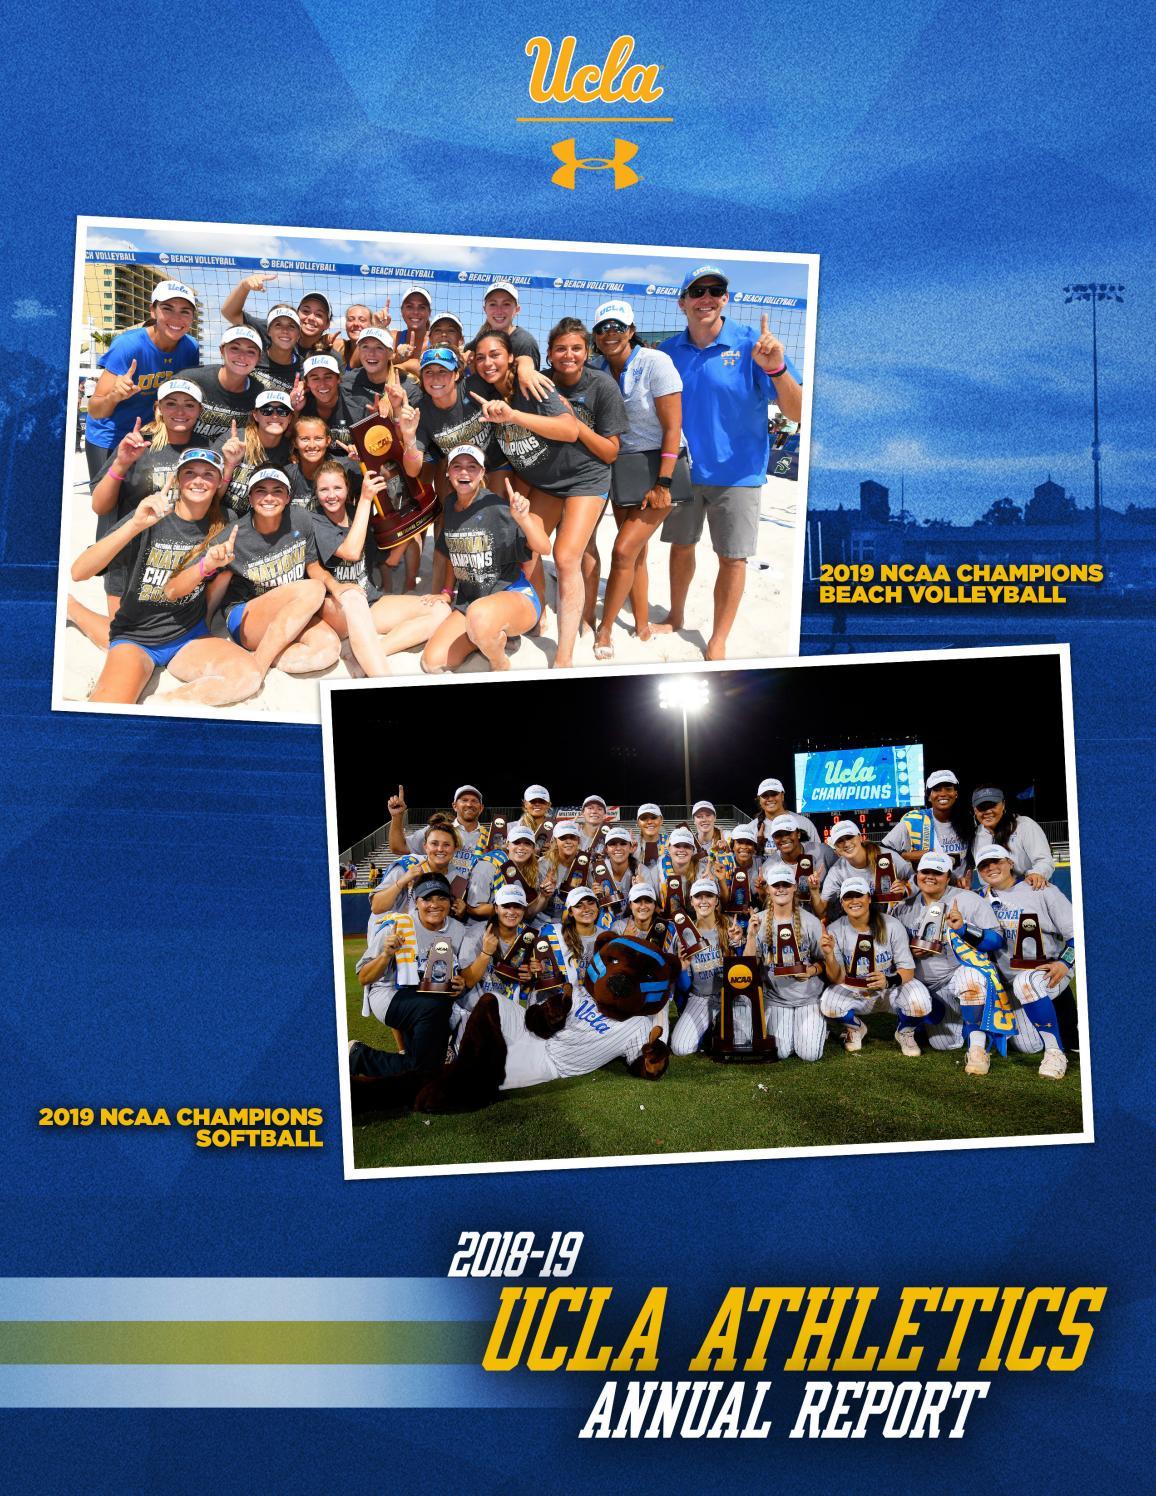 2018-19 UCLA Athletics Annual Report by UCLA Athletics - issuu